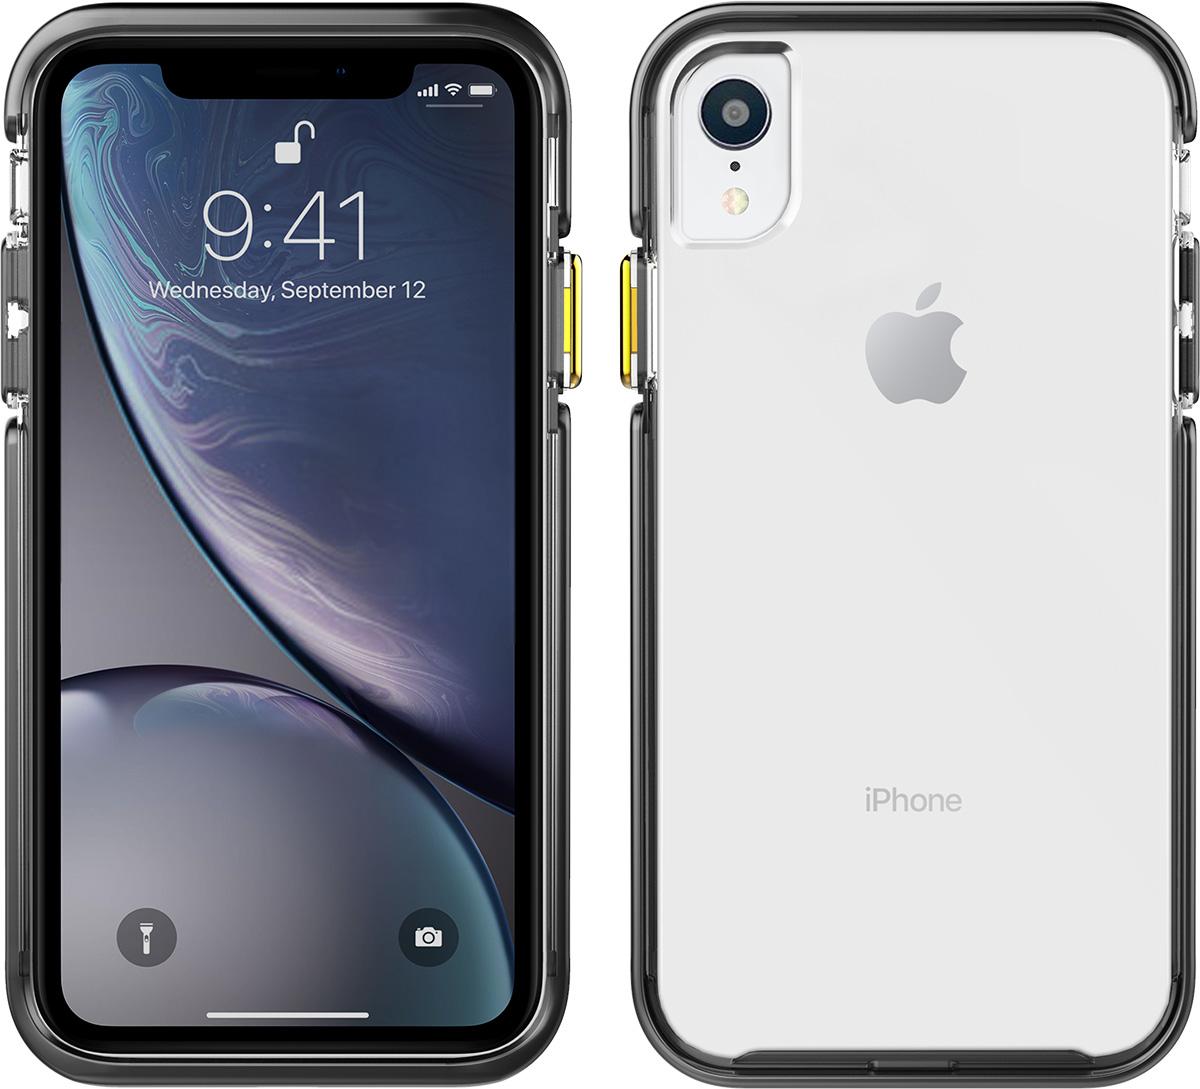 pelican apple iphone c42130 ambassador black gold phone case